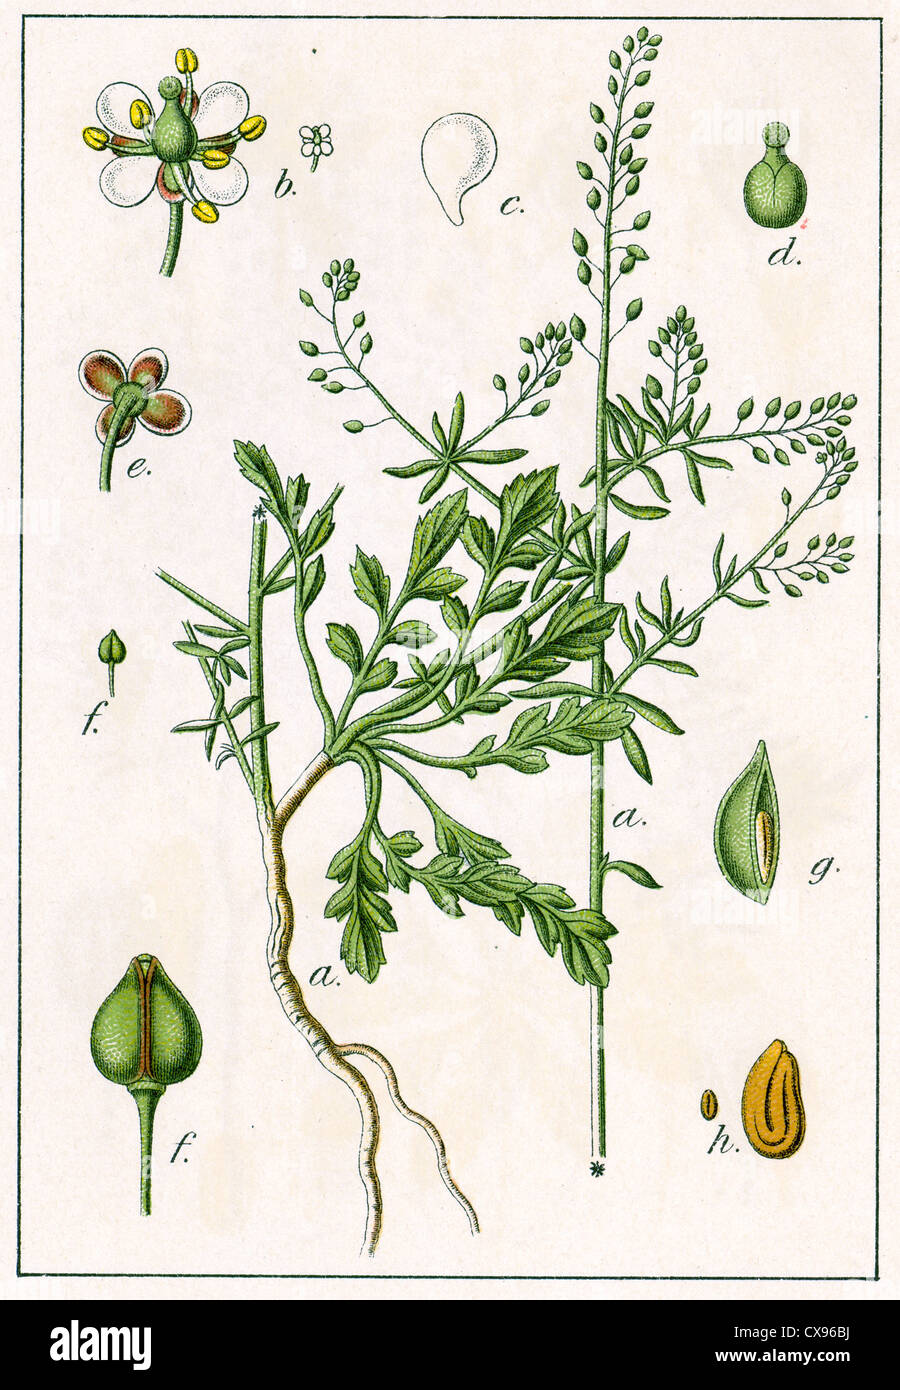 Crucifera graminifolia - Stock Image